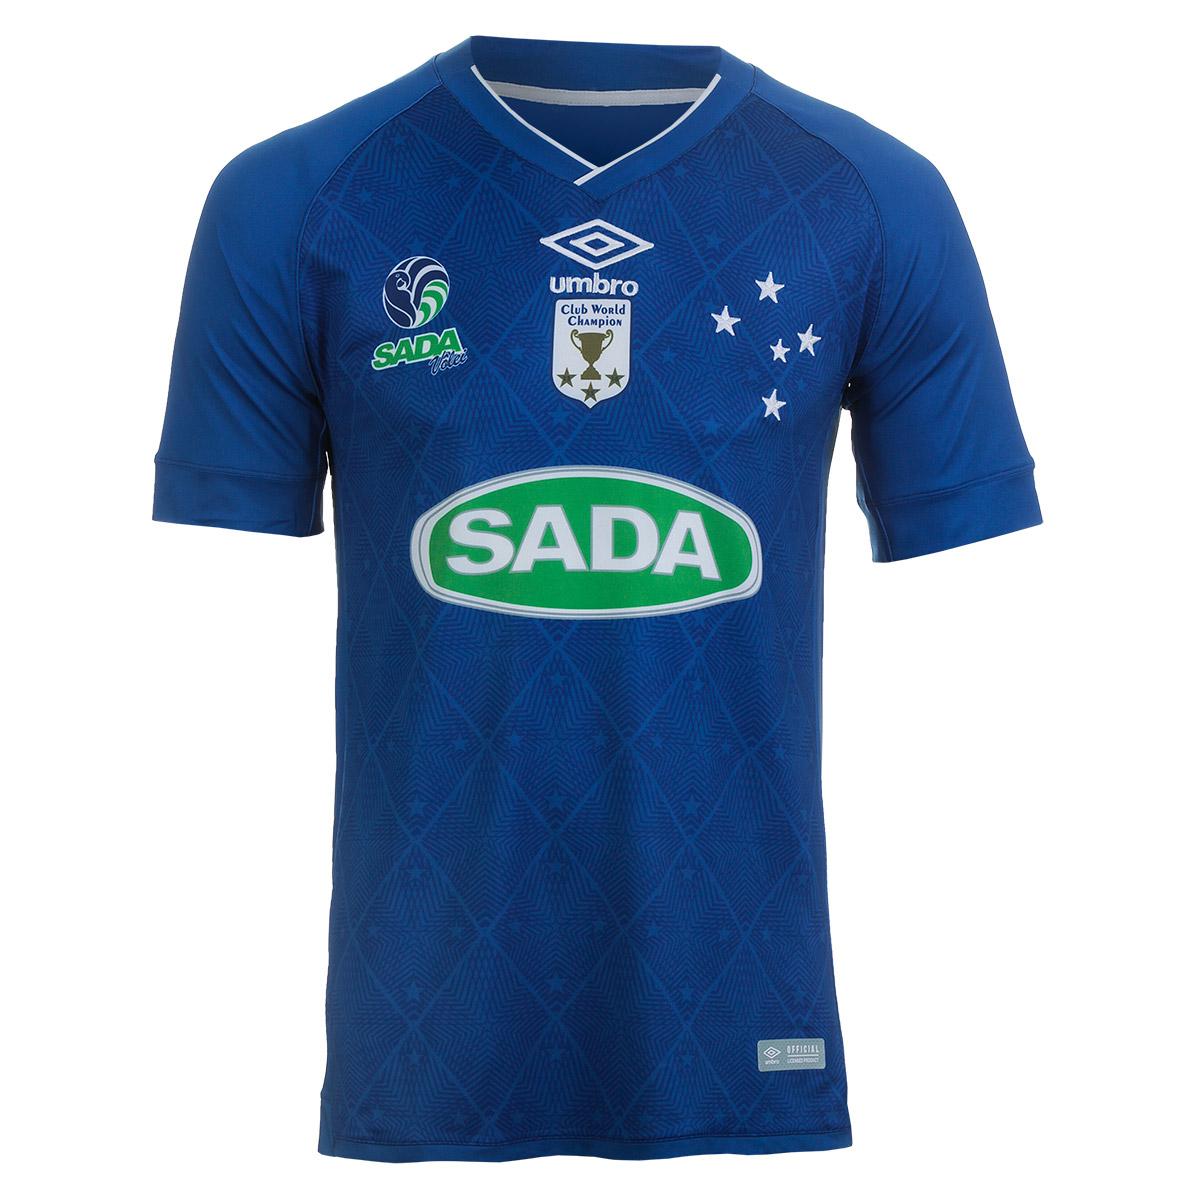 Camiseta Masc. Umbro Cruzeiro Volei Of.3 Casual - Azul Marinho/Branco